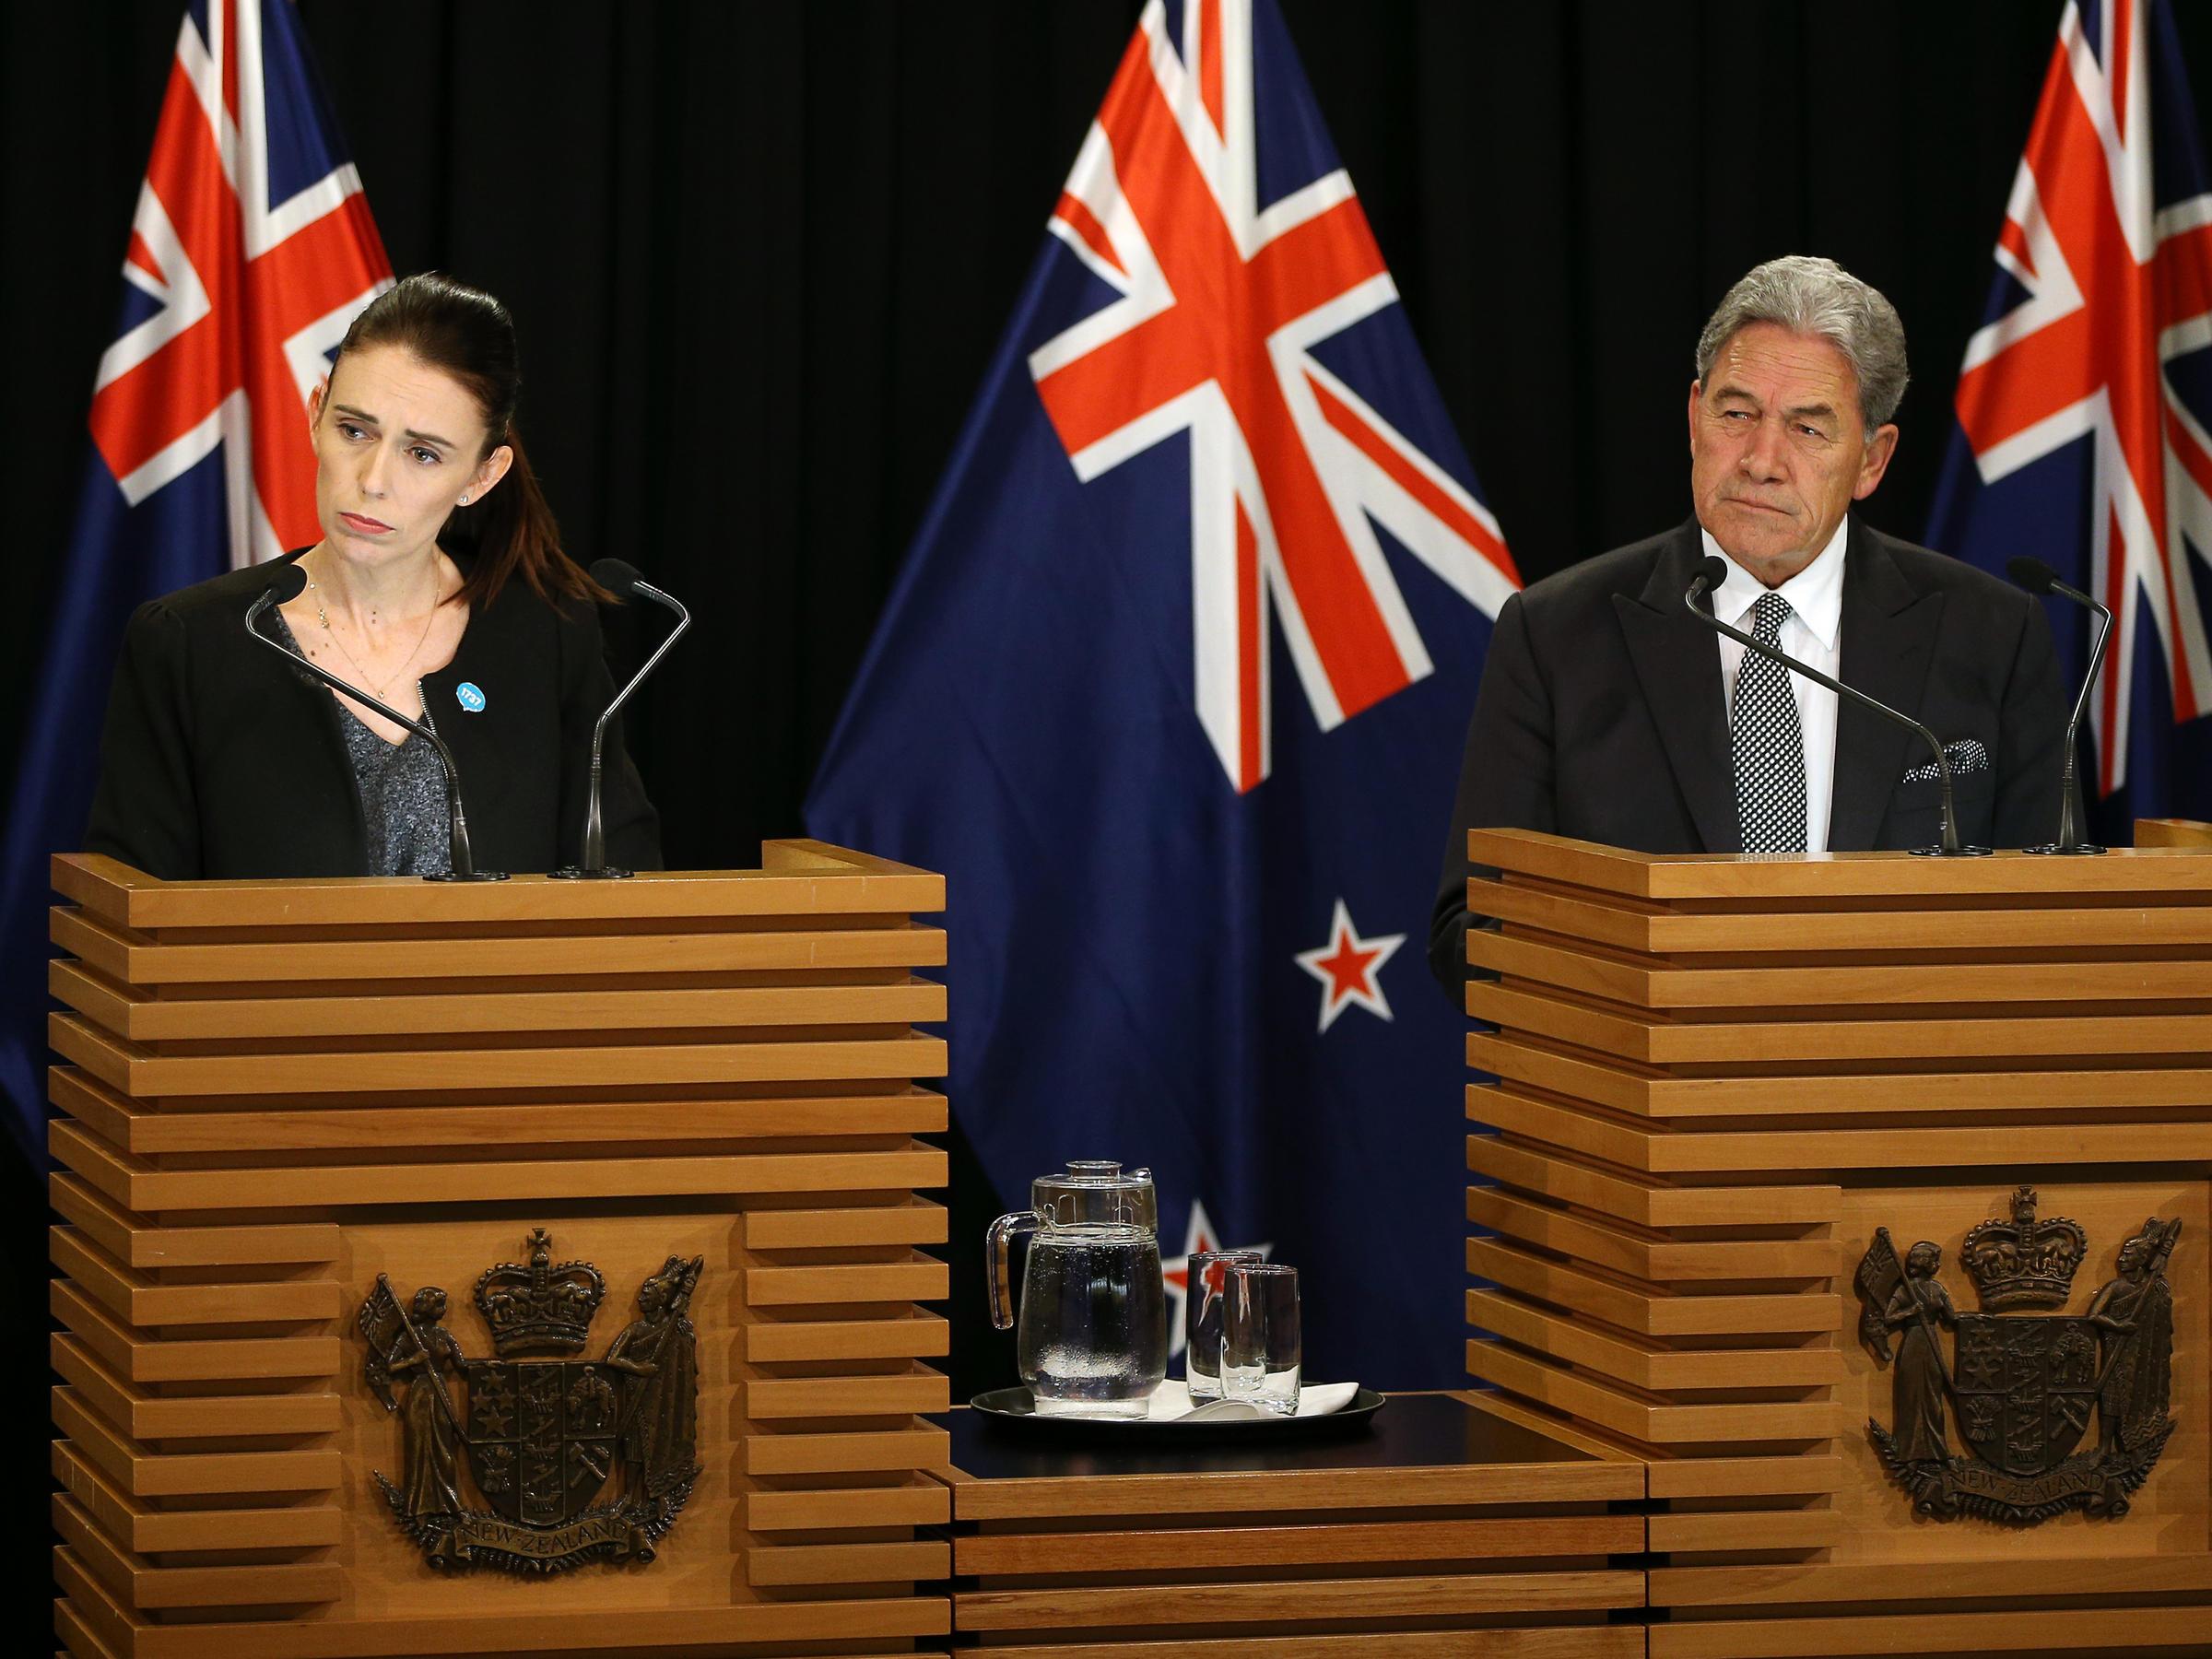 New Zealand Prime Minister Promises Tighter Gun Laws